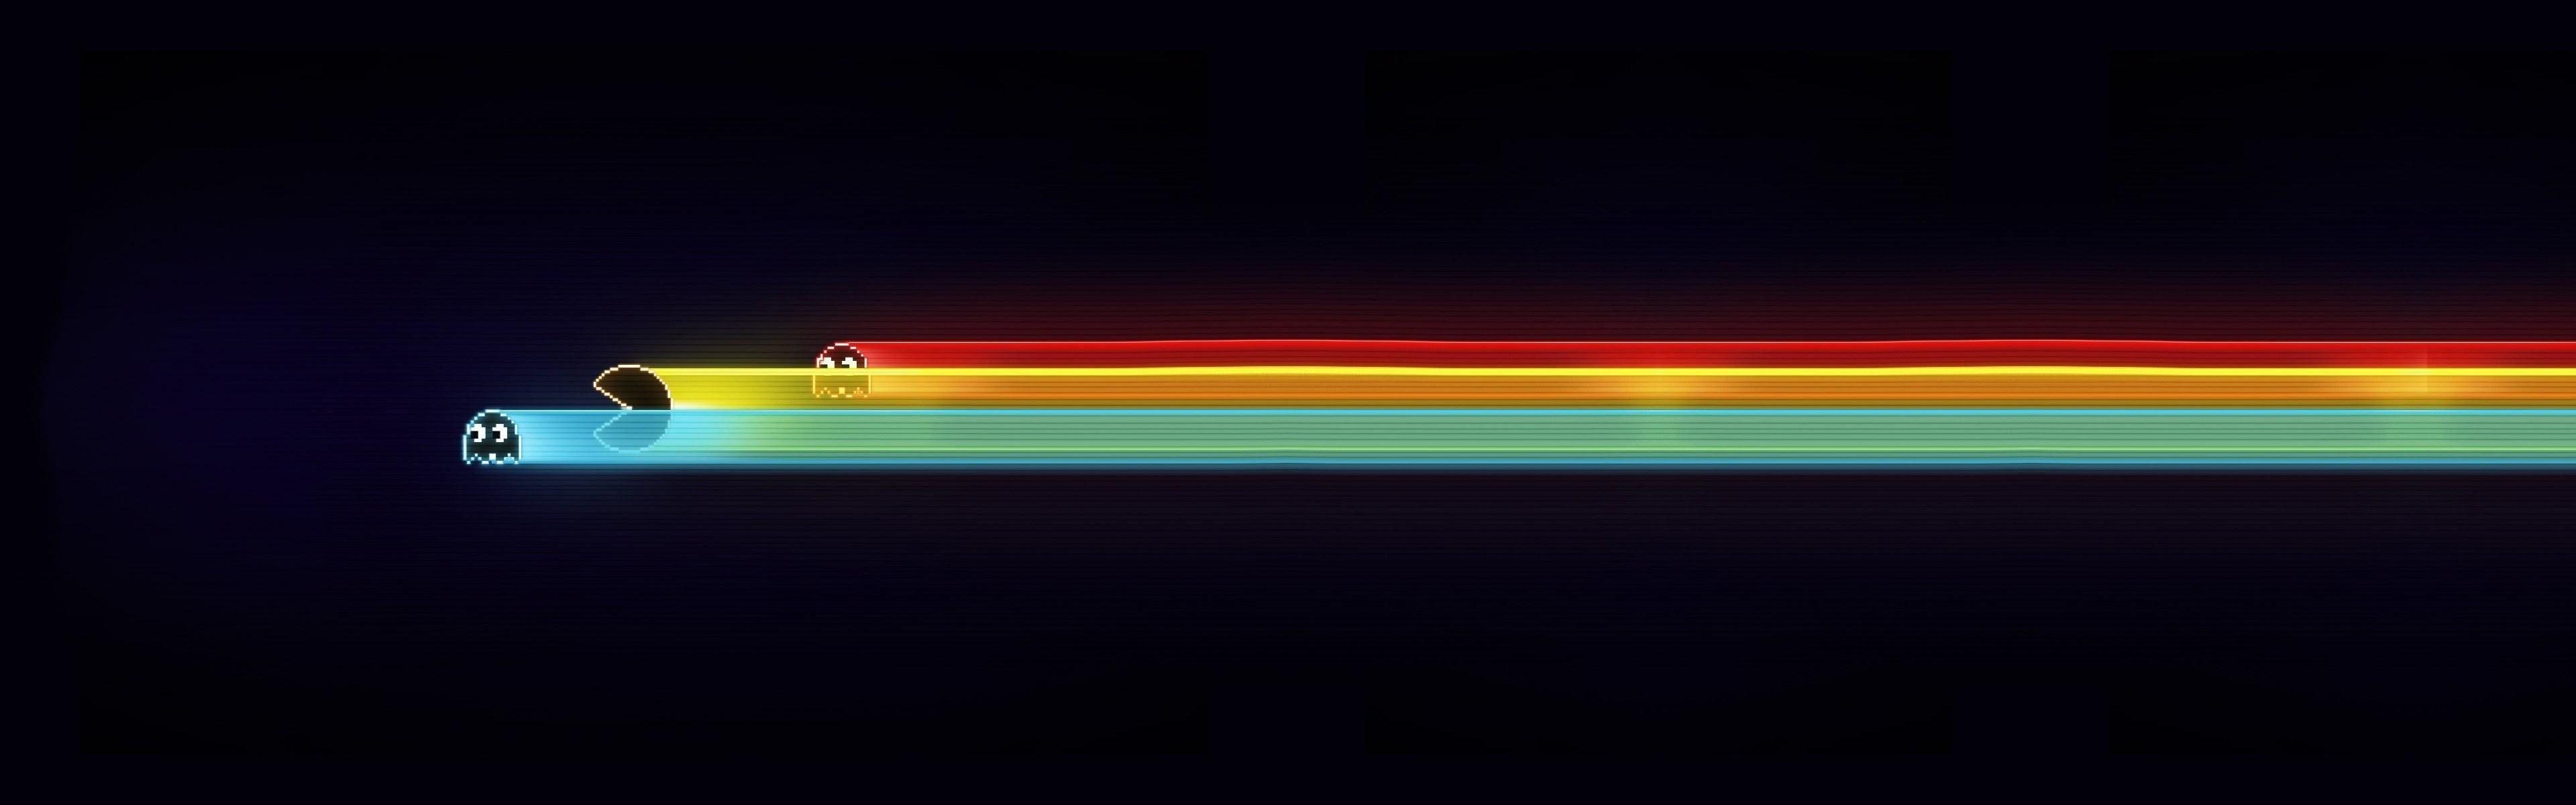 dual screen wallpaper,light,atmosphere,line,sky,horizon